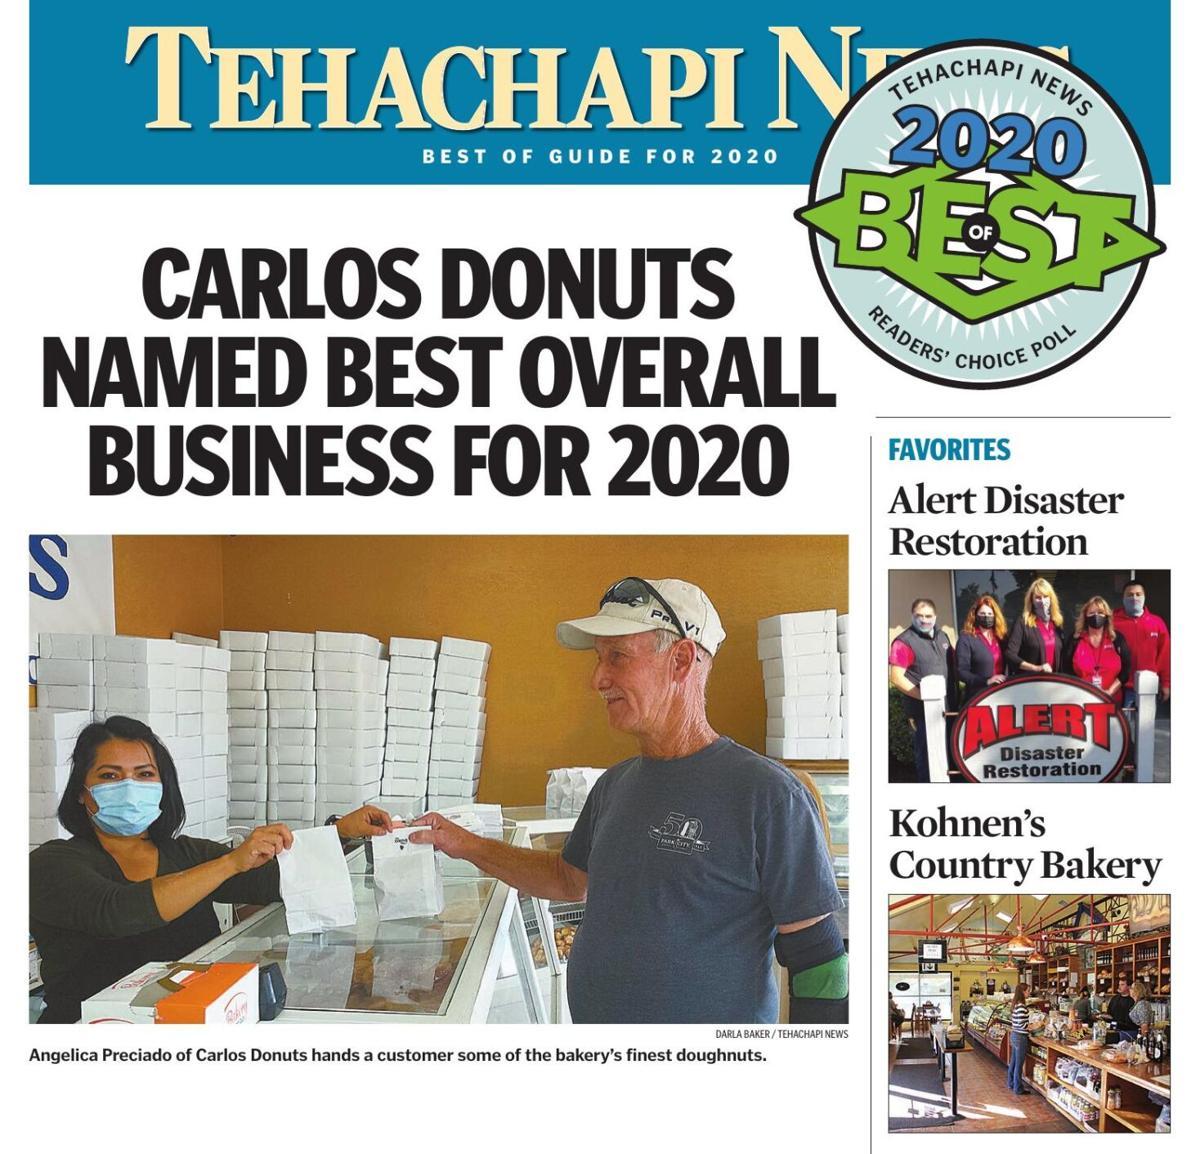 Tehachapi News' Best of 2020